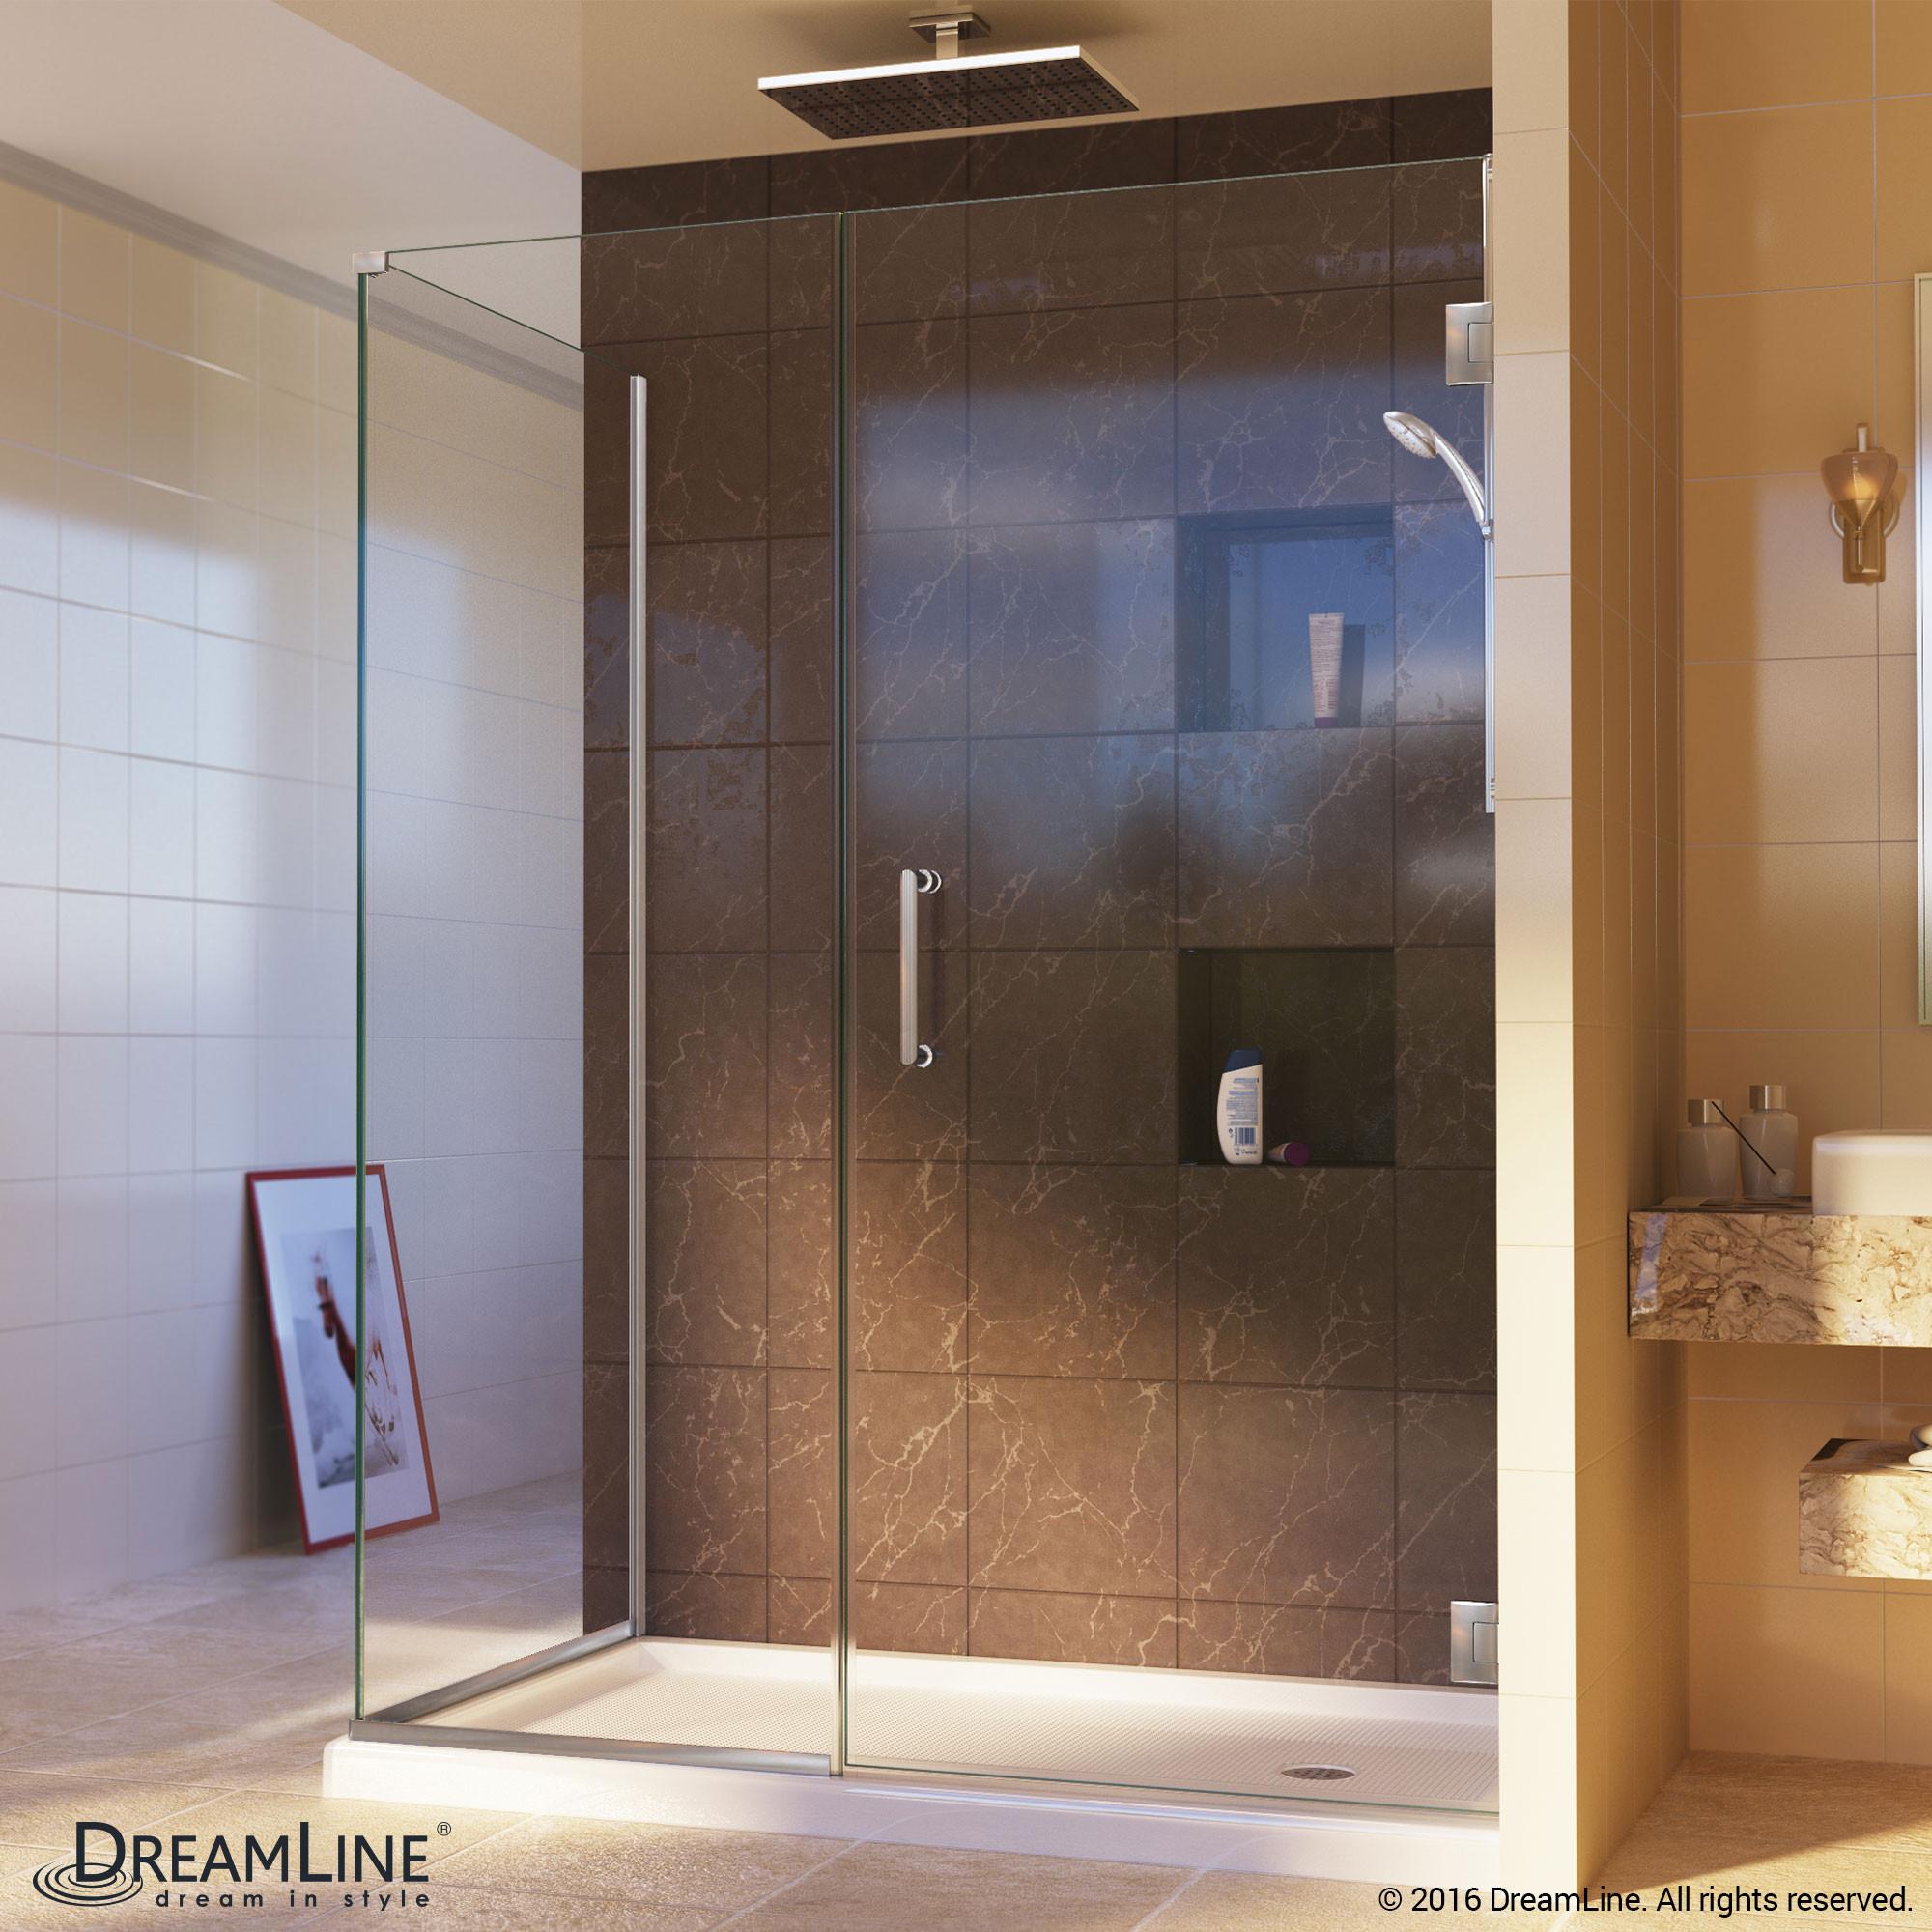 DreamLine SHEN-24405300-04 Unidoor Plus Hinged Shower Enclosure In Brushed Nickel Finish Hardware